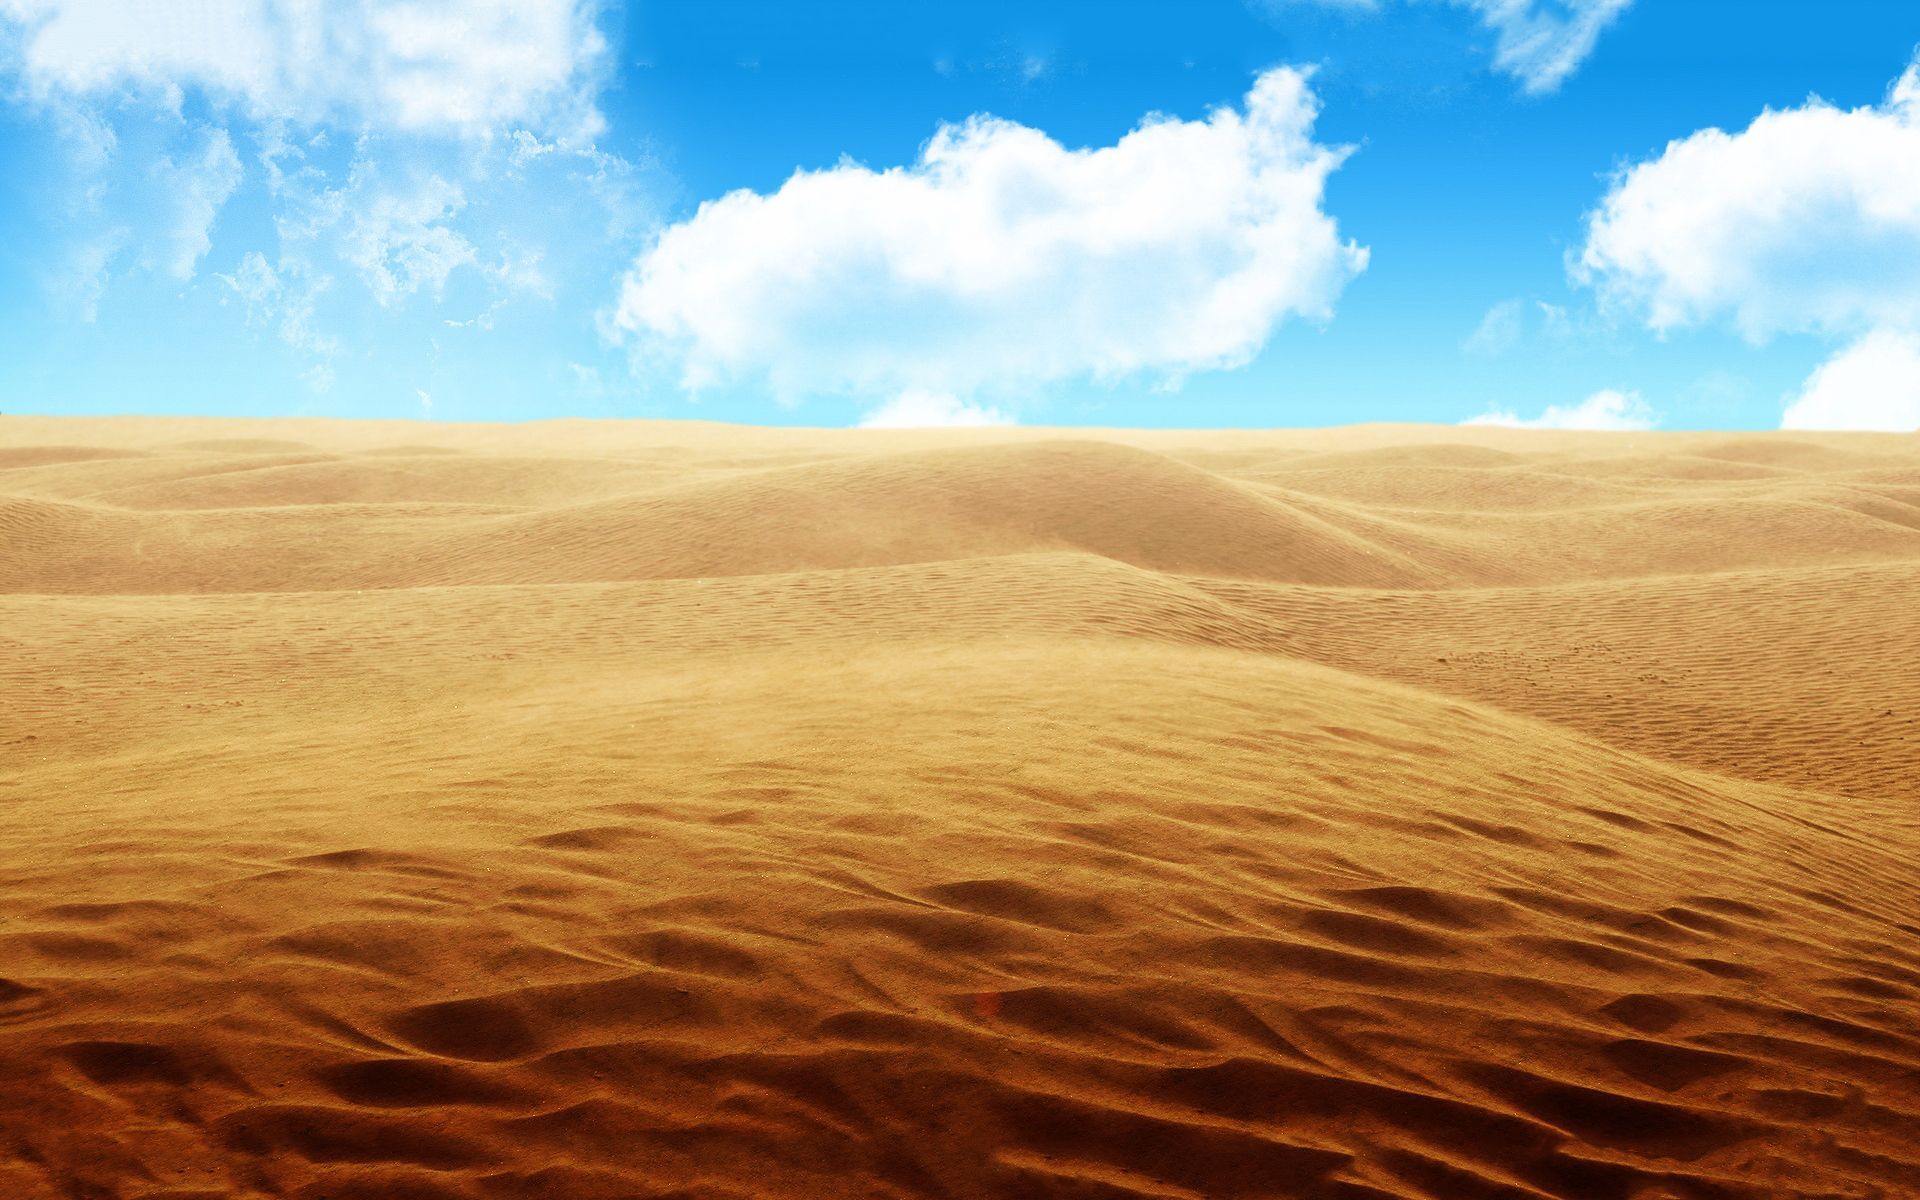 View Dune Wallpaper 1080P Gif